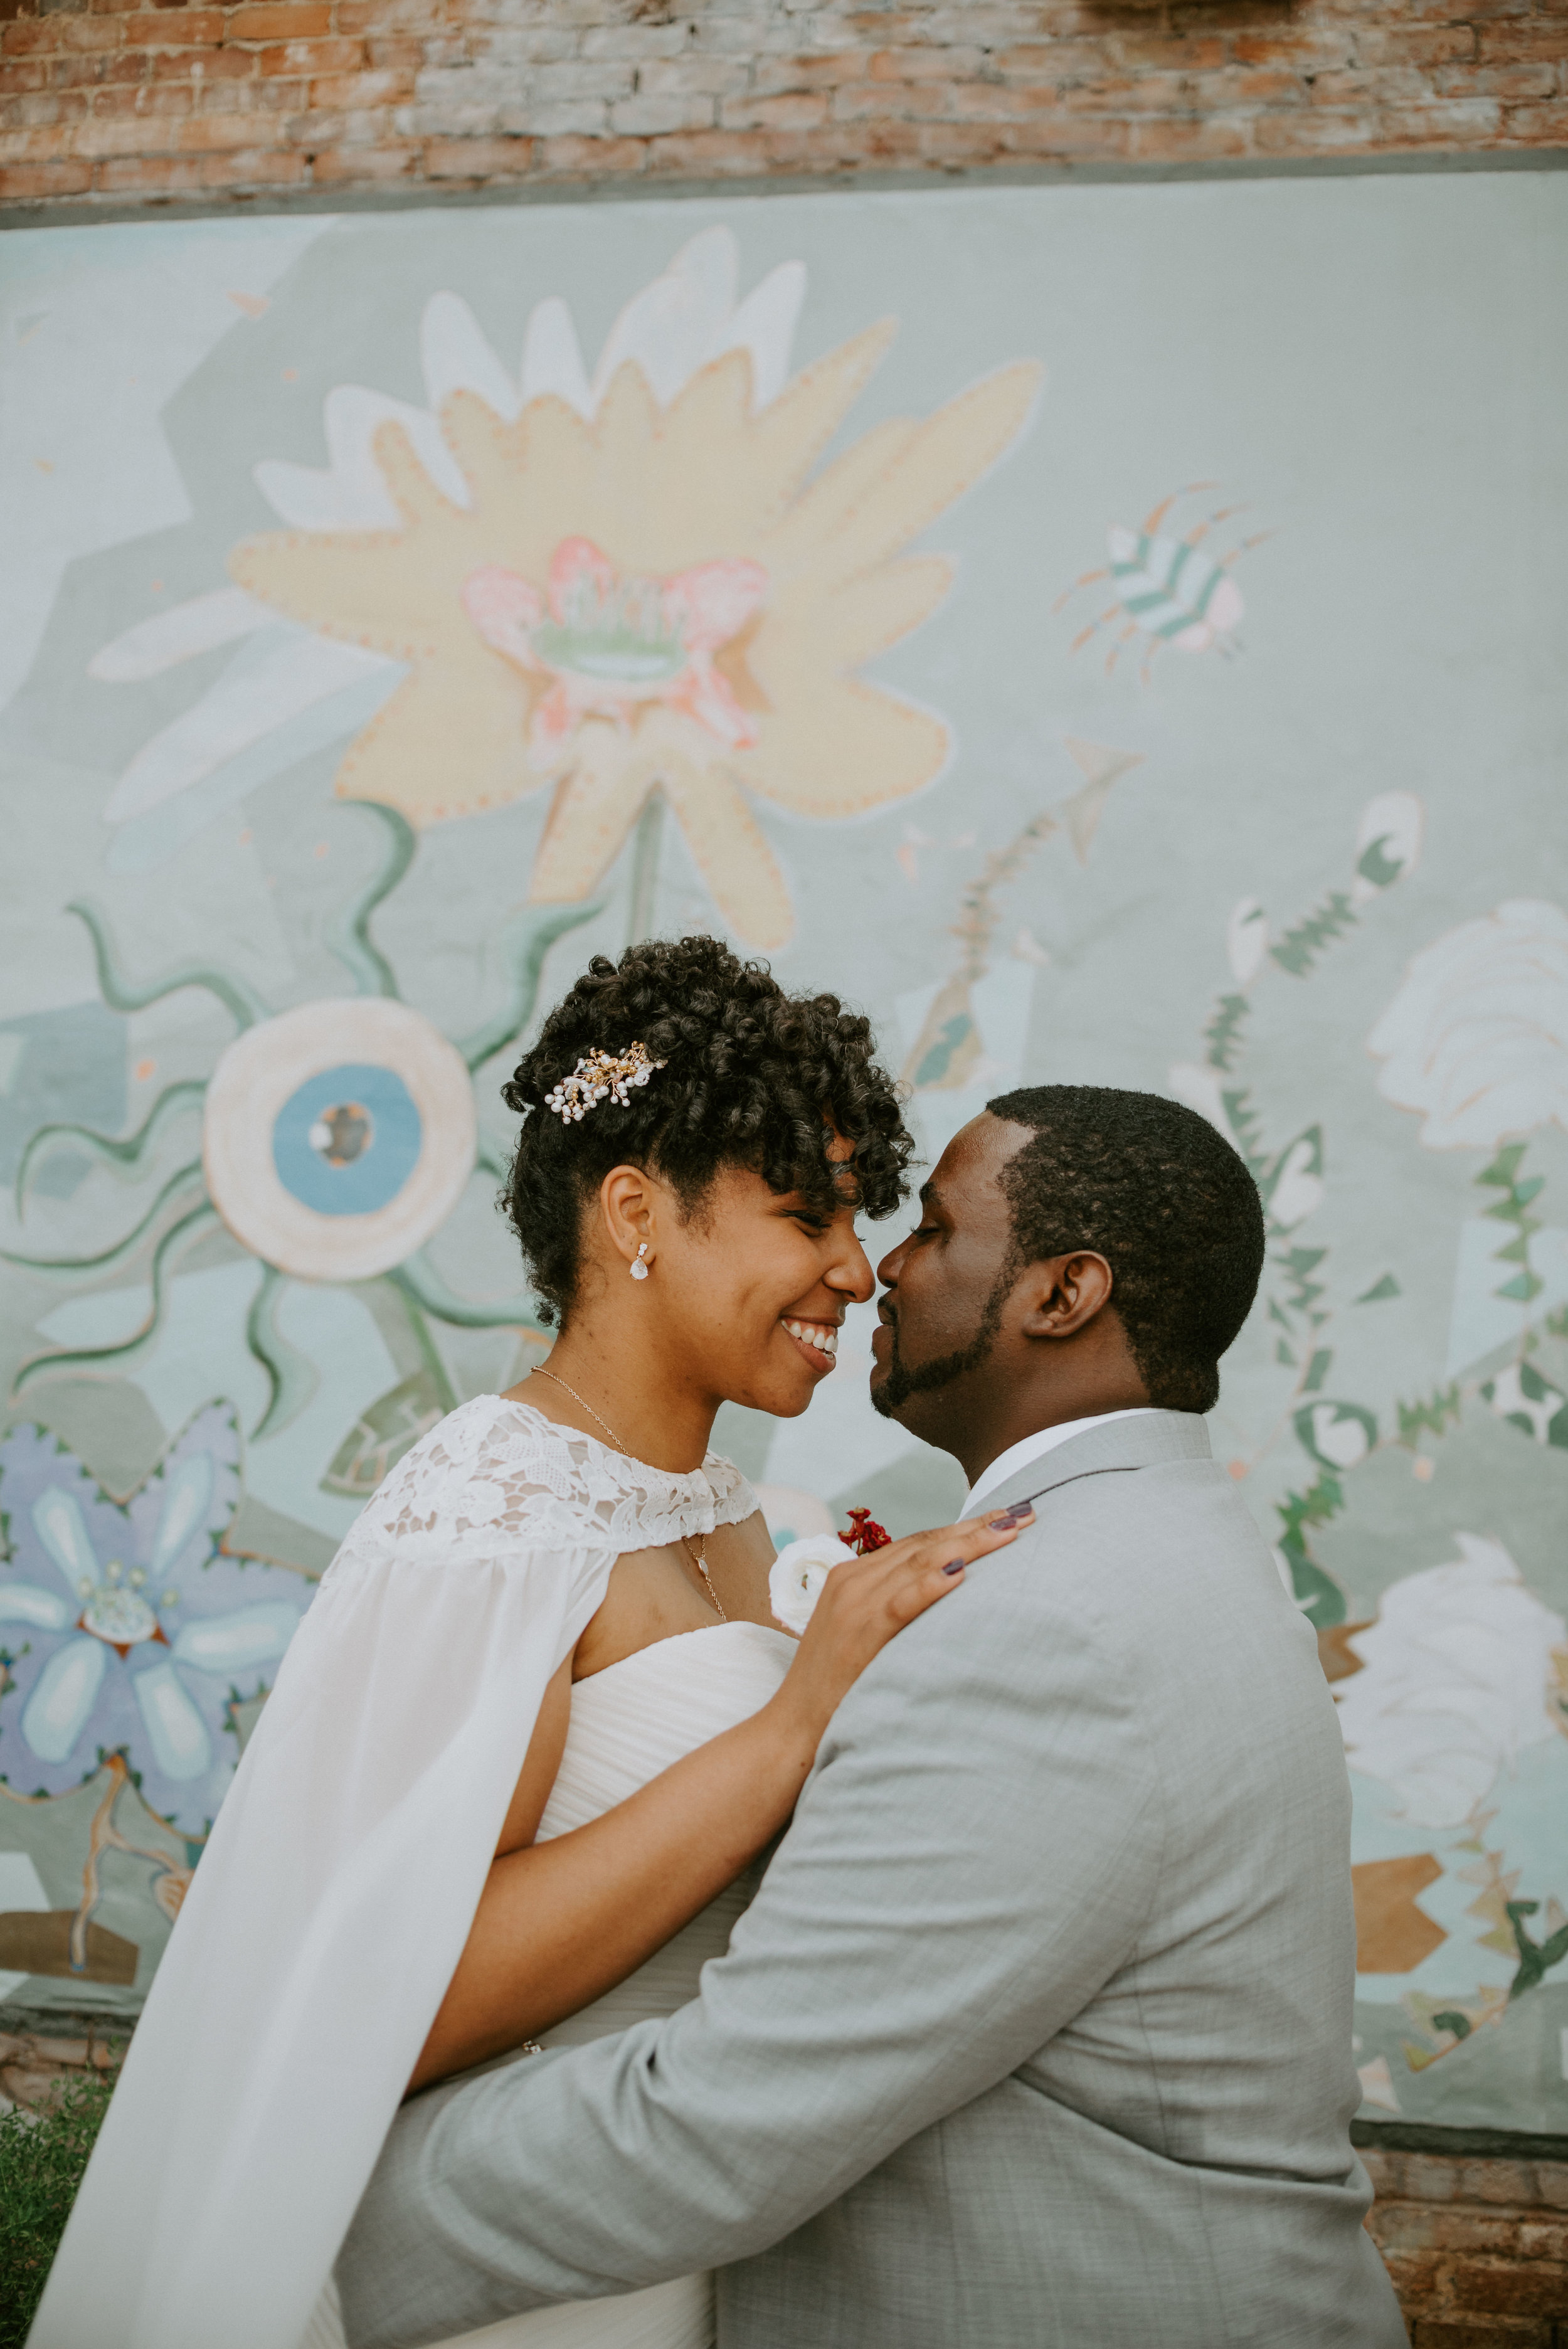 WonderlyCreative_Wedding_6.7.18_Khara&Dwayne_-744.jpg